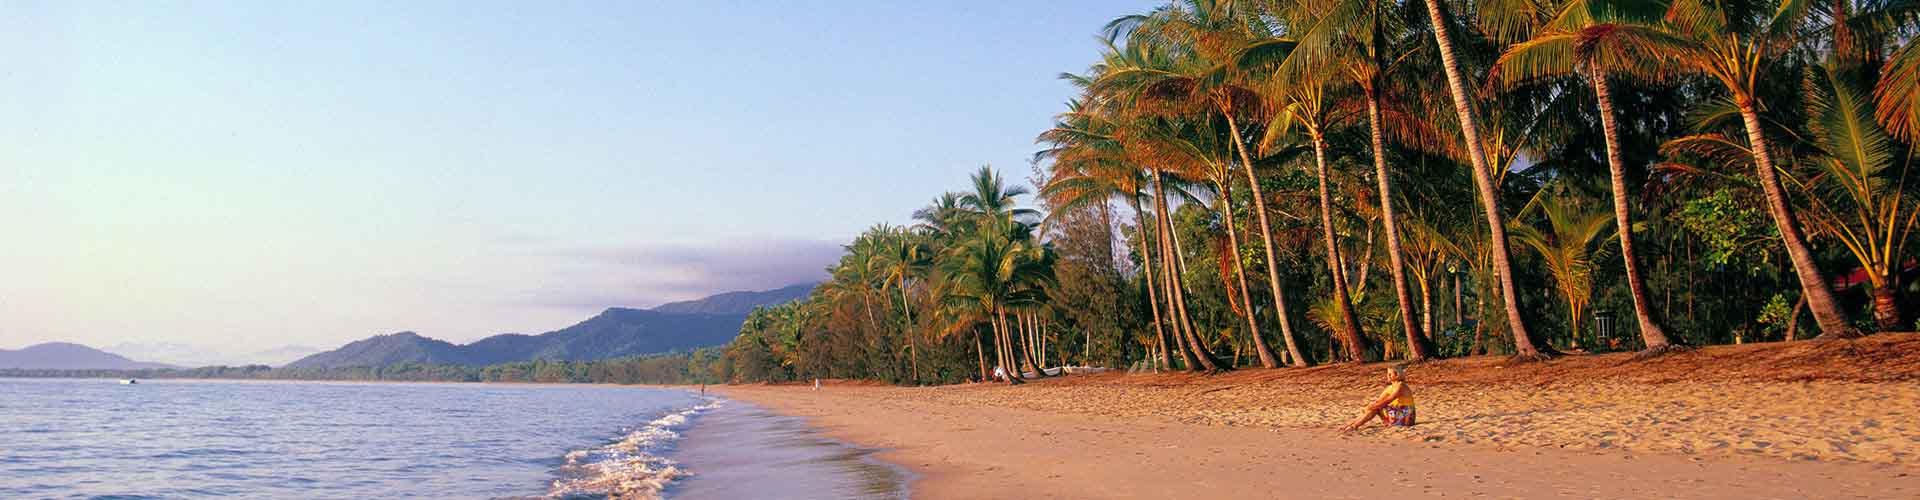 Cairns - Campamentos en Cairns. Mapas de Cairns, Fotos y comentarios de cada Campamento en Cairns.